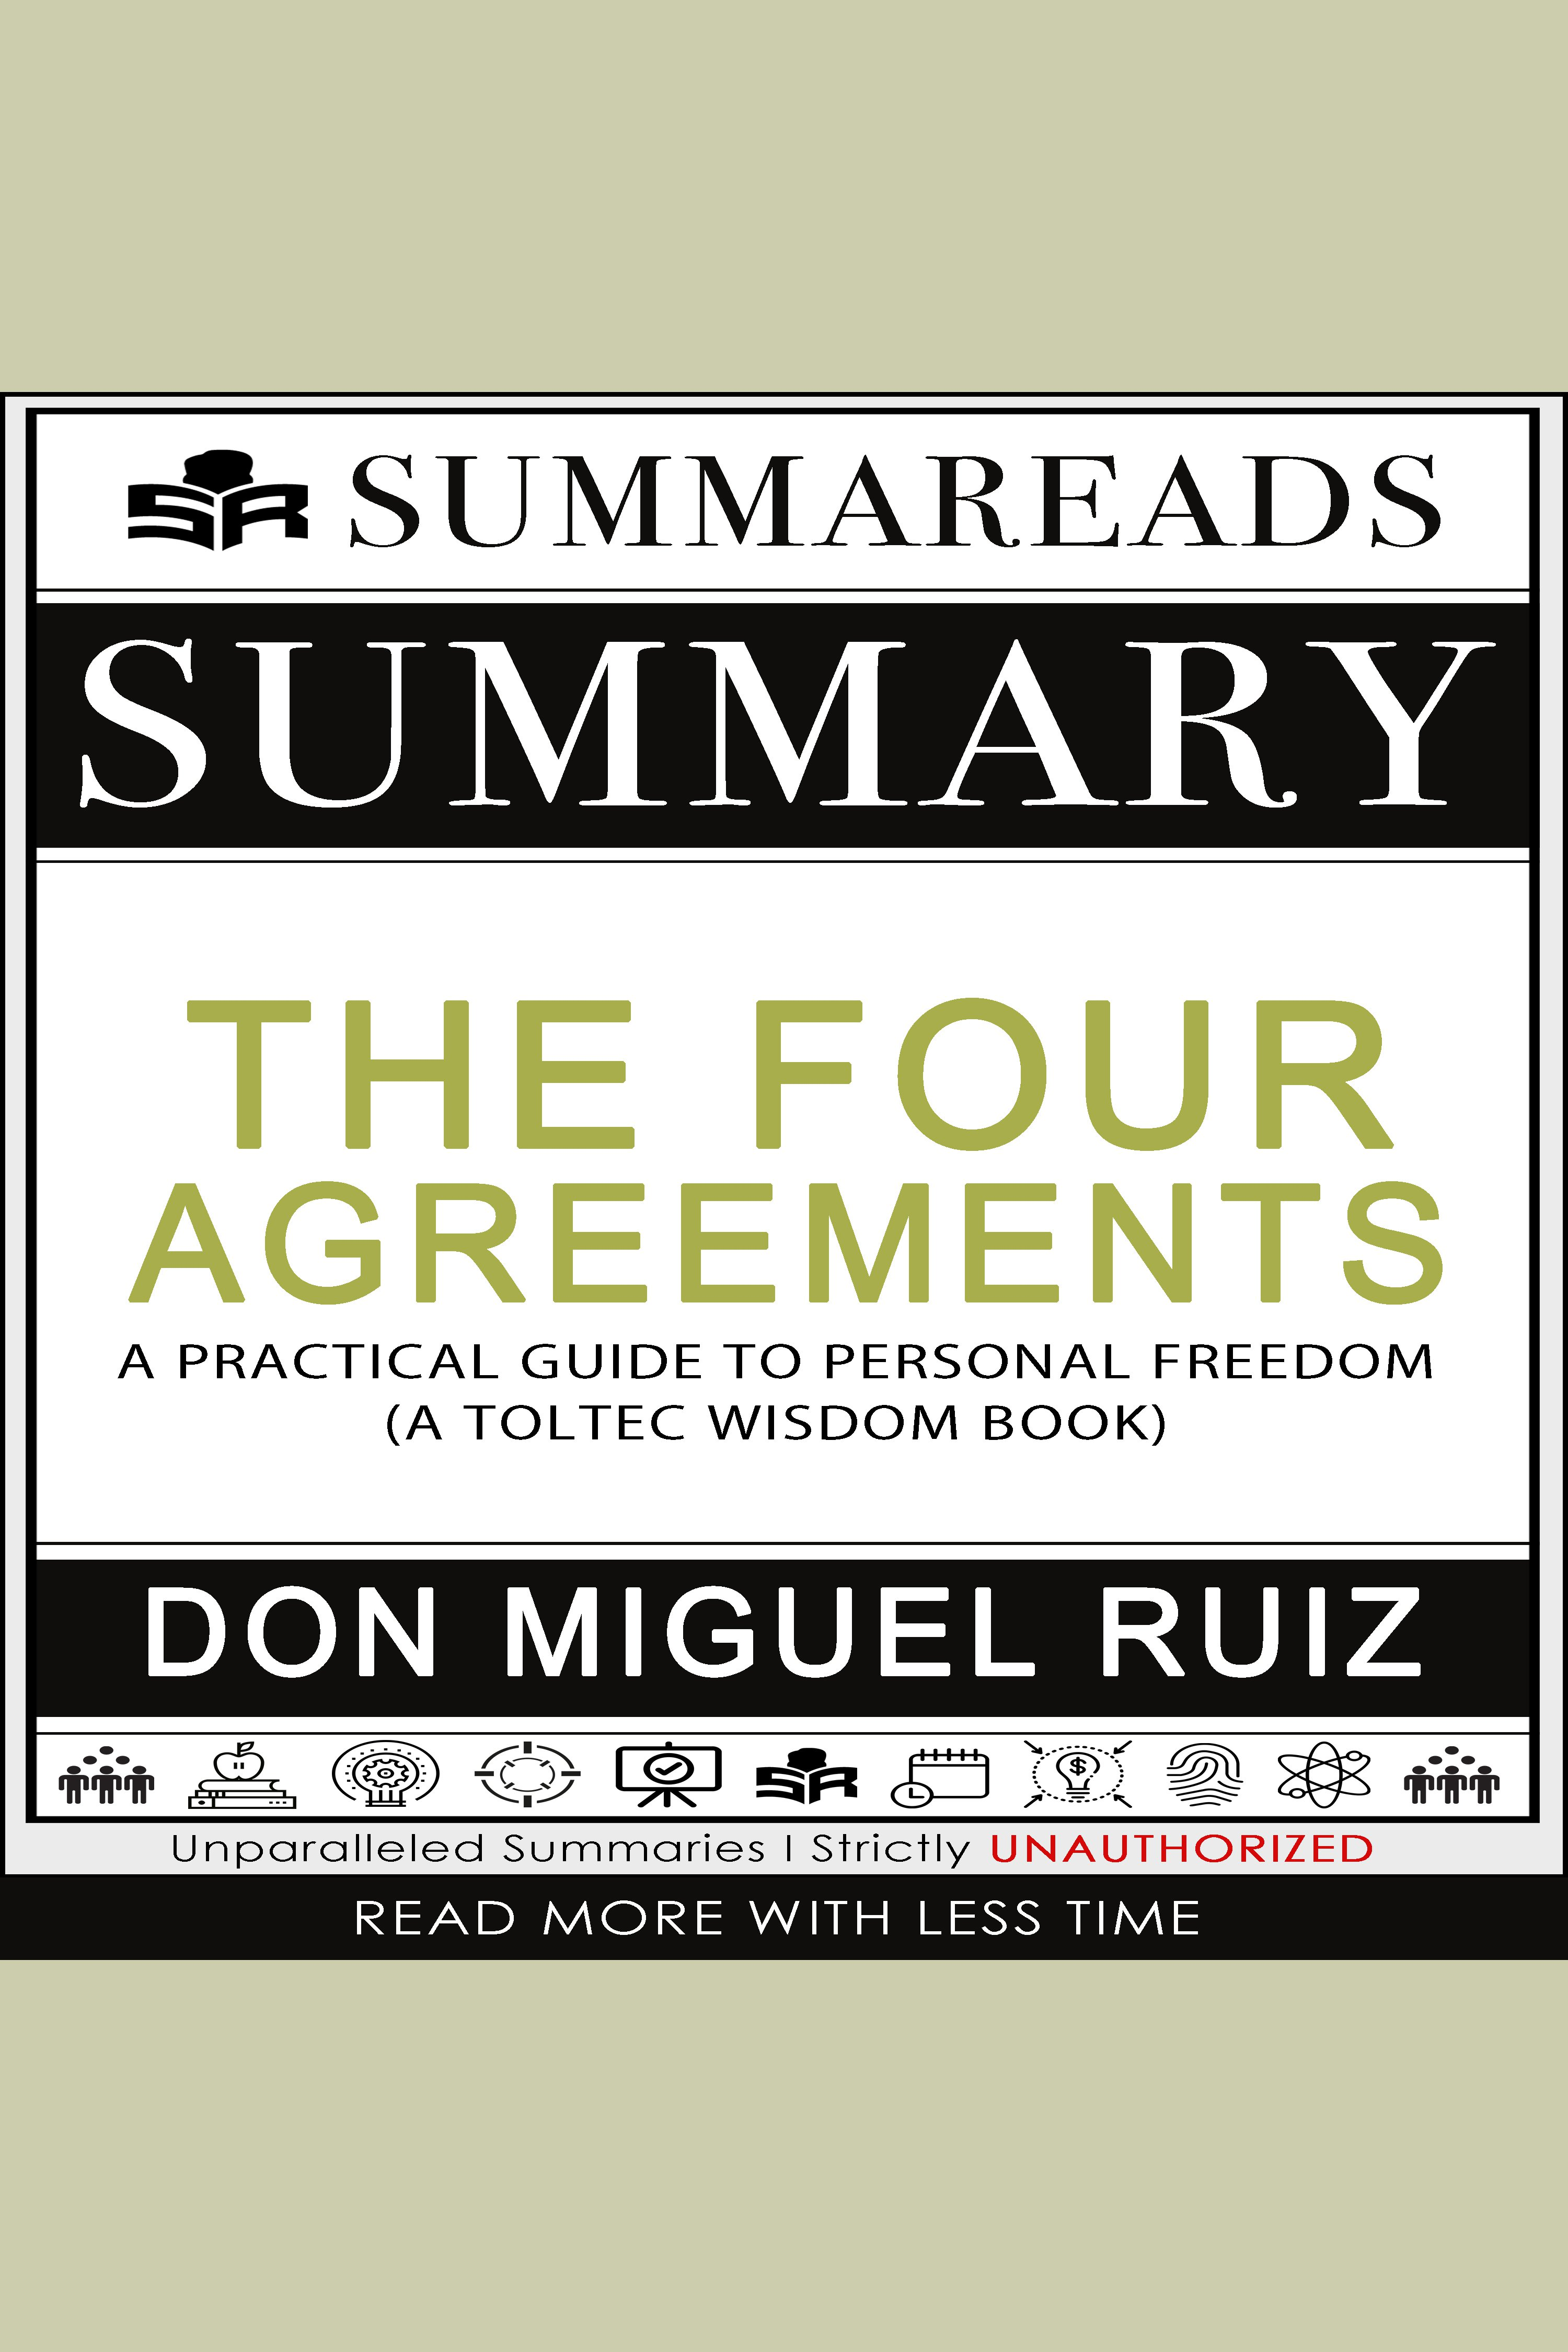 Esta es la portada del audiolibro Summary of The Four Agreements: A Practical Guide to Personal Freedom (A Toltec Wisdom Book) by Don Miguel Ruiz